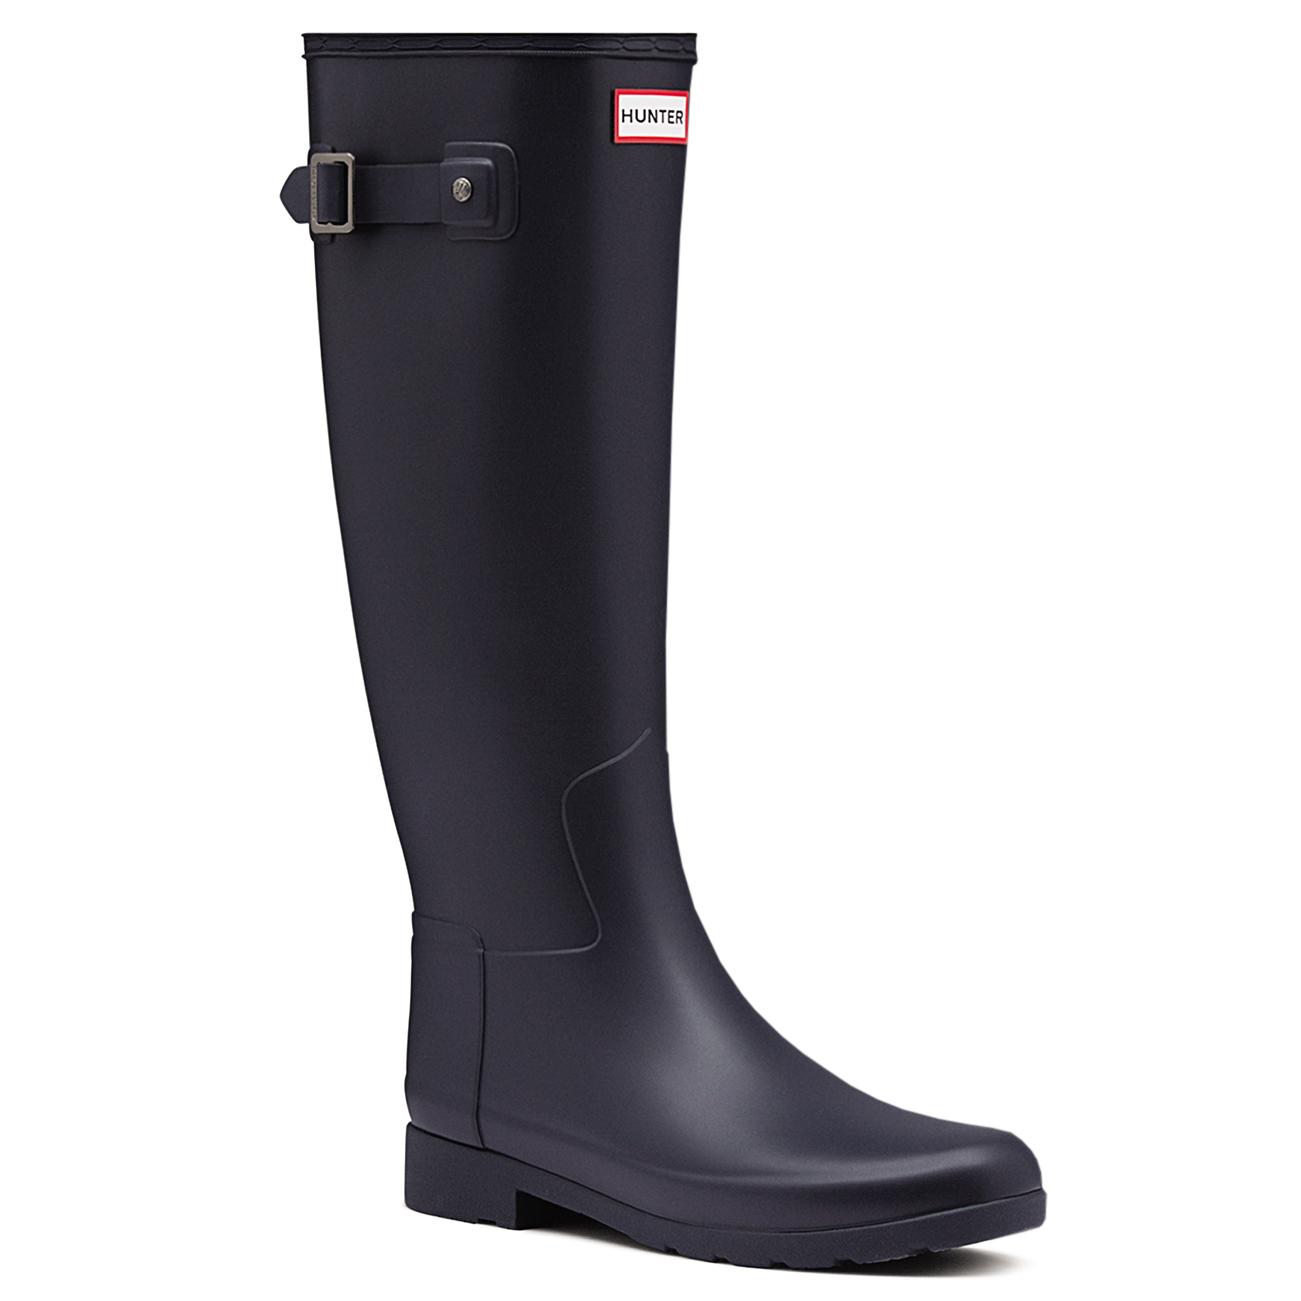 Luxury Womens Hunter Original Tour Rain Winter Snow Festival Wellington Boots US 5-11